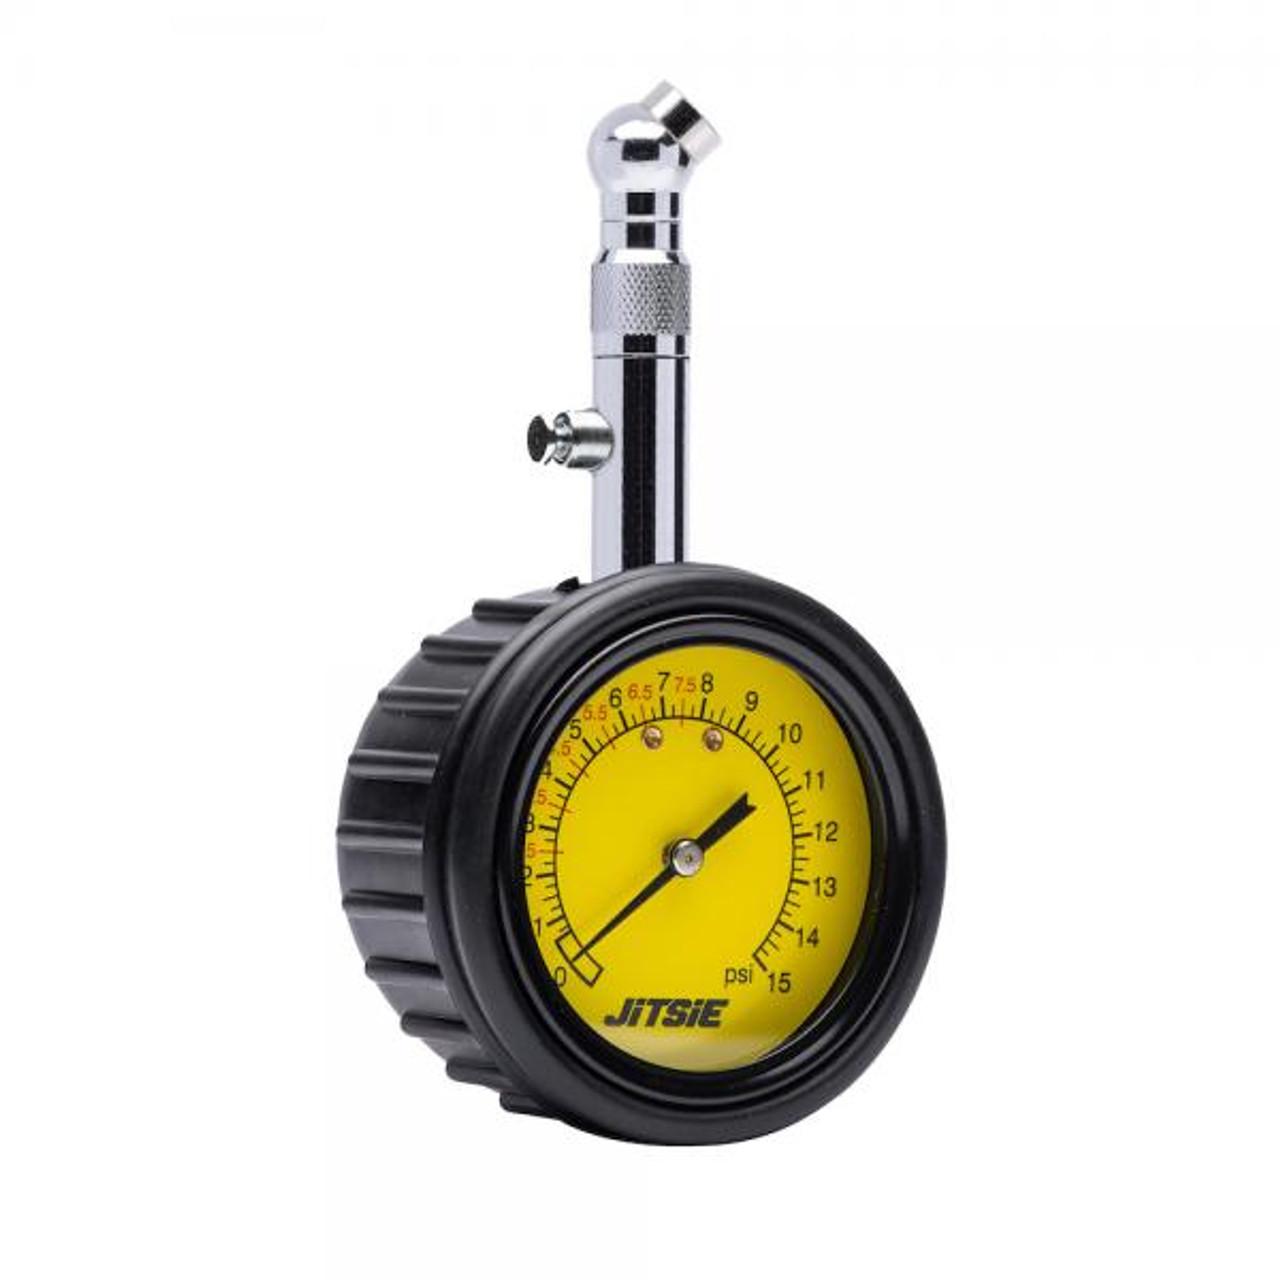 Analog tire pressure meter with valve, 0- 15PSI